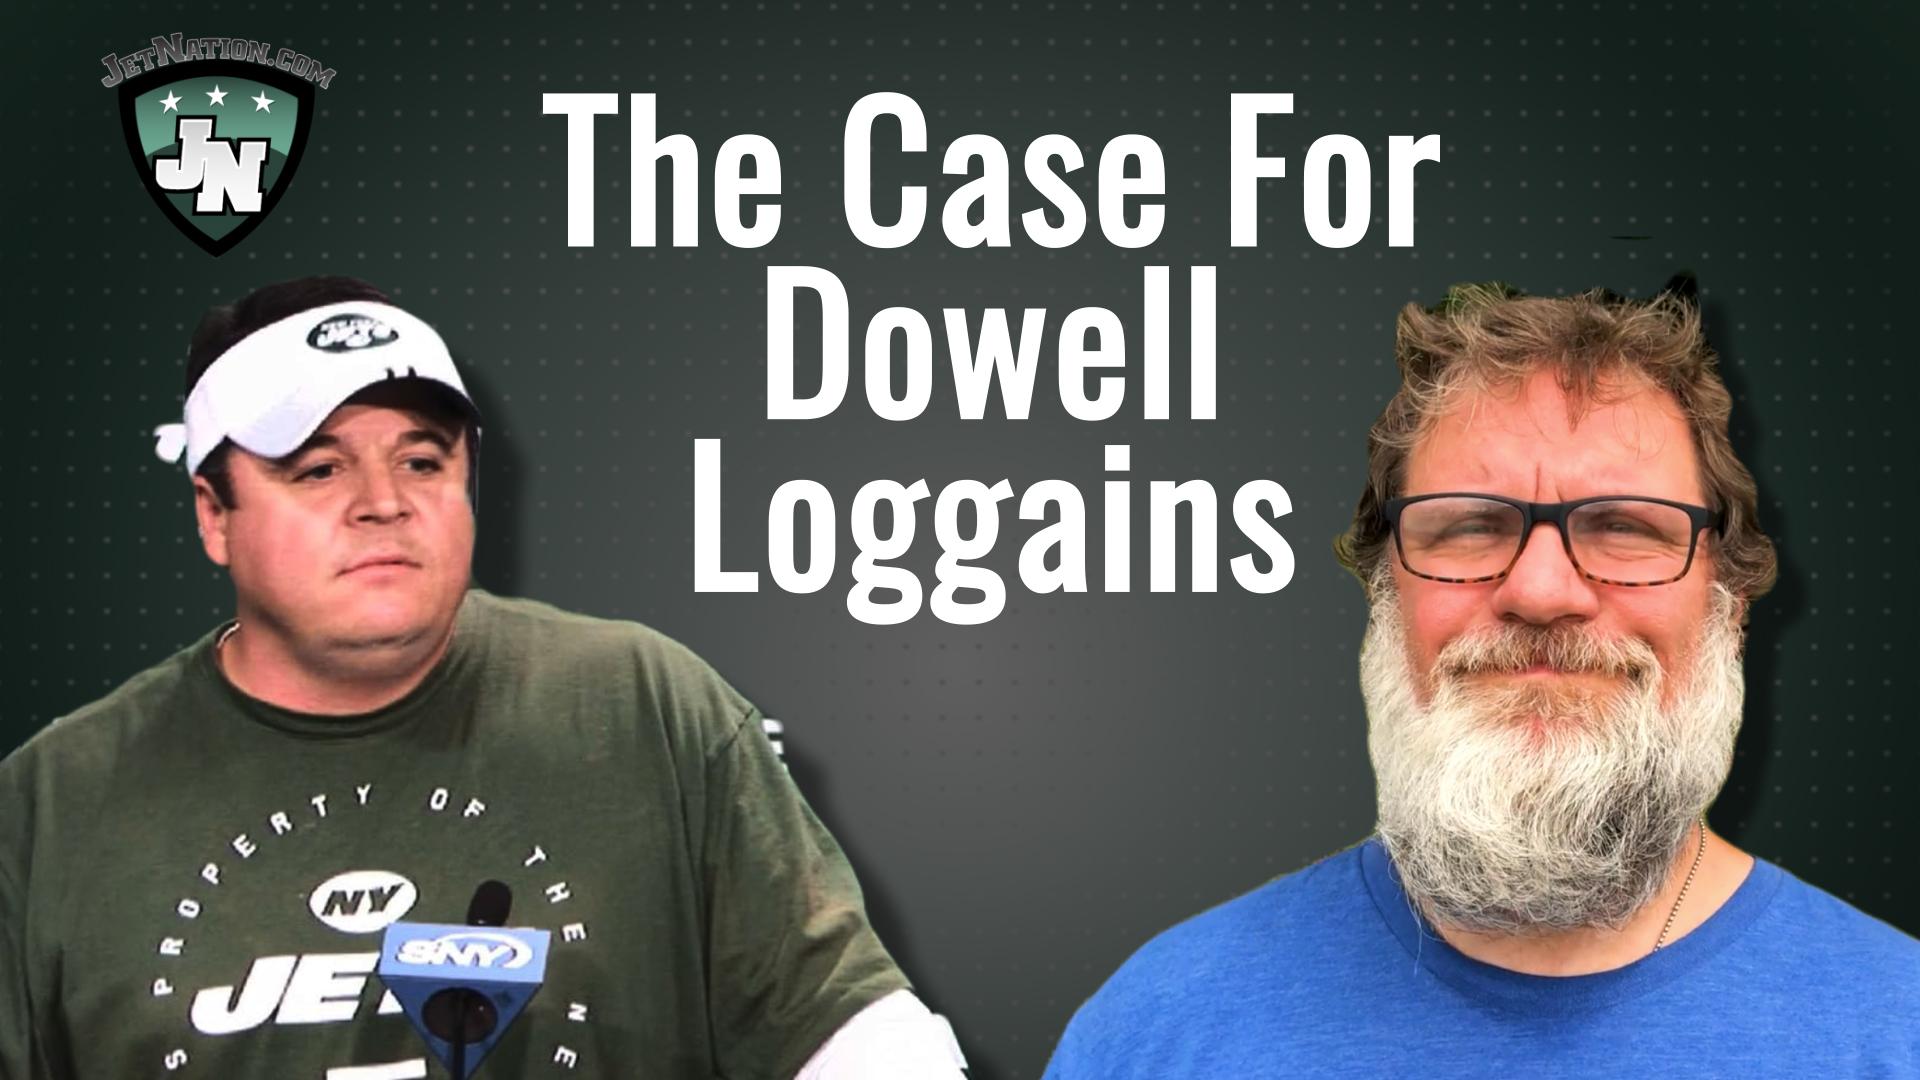 Dowell Loggains